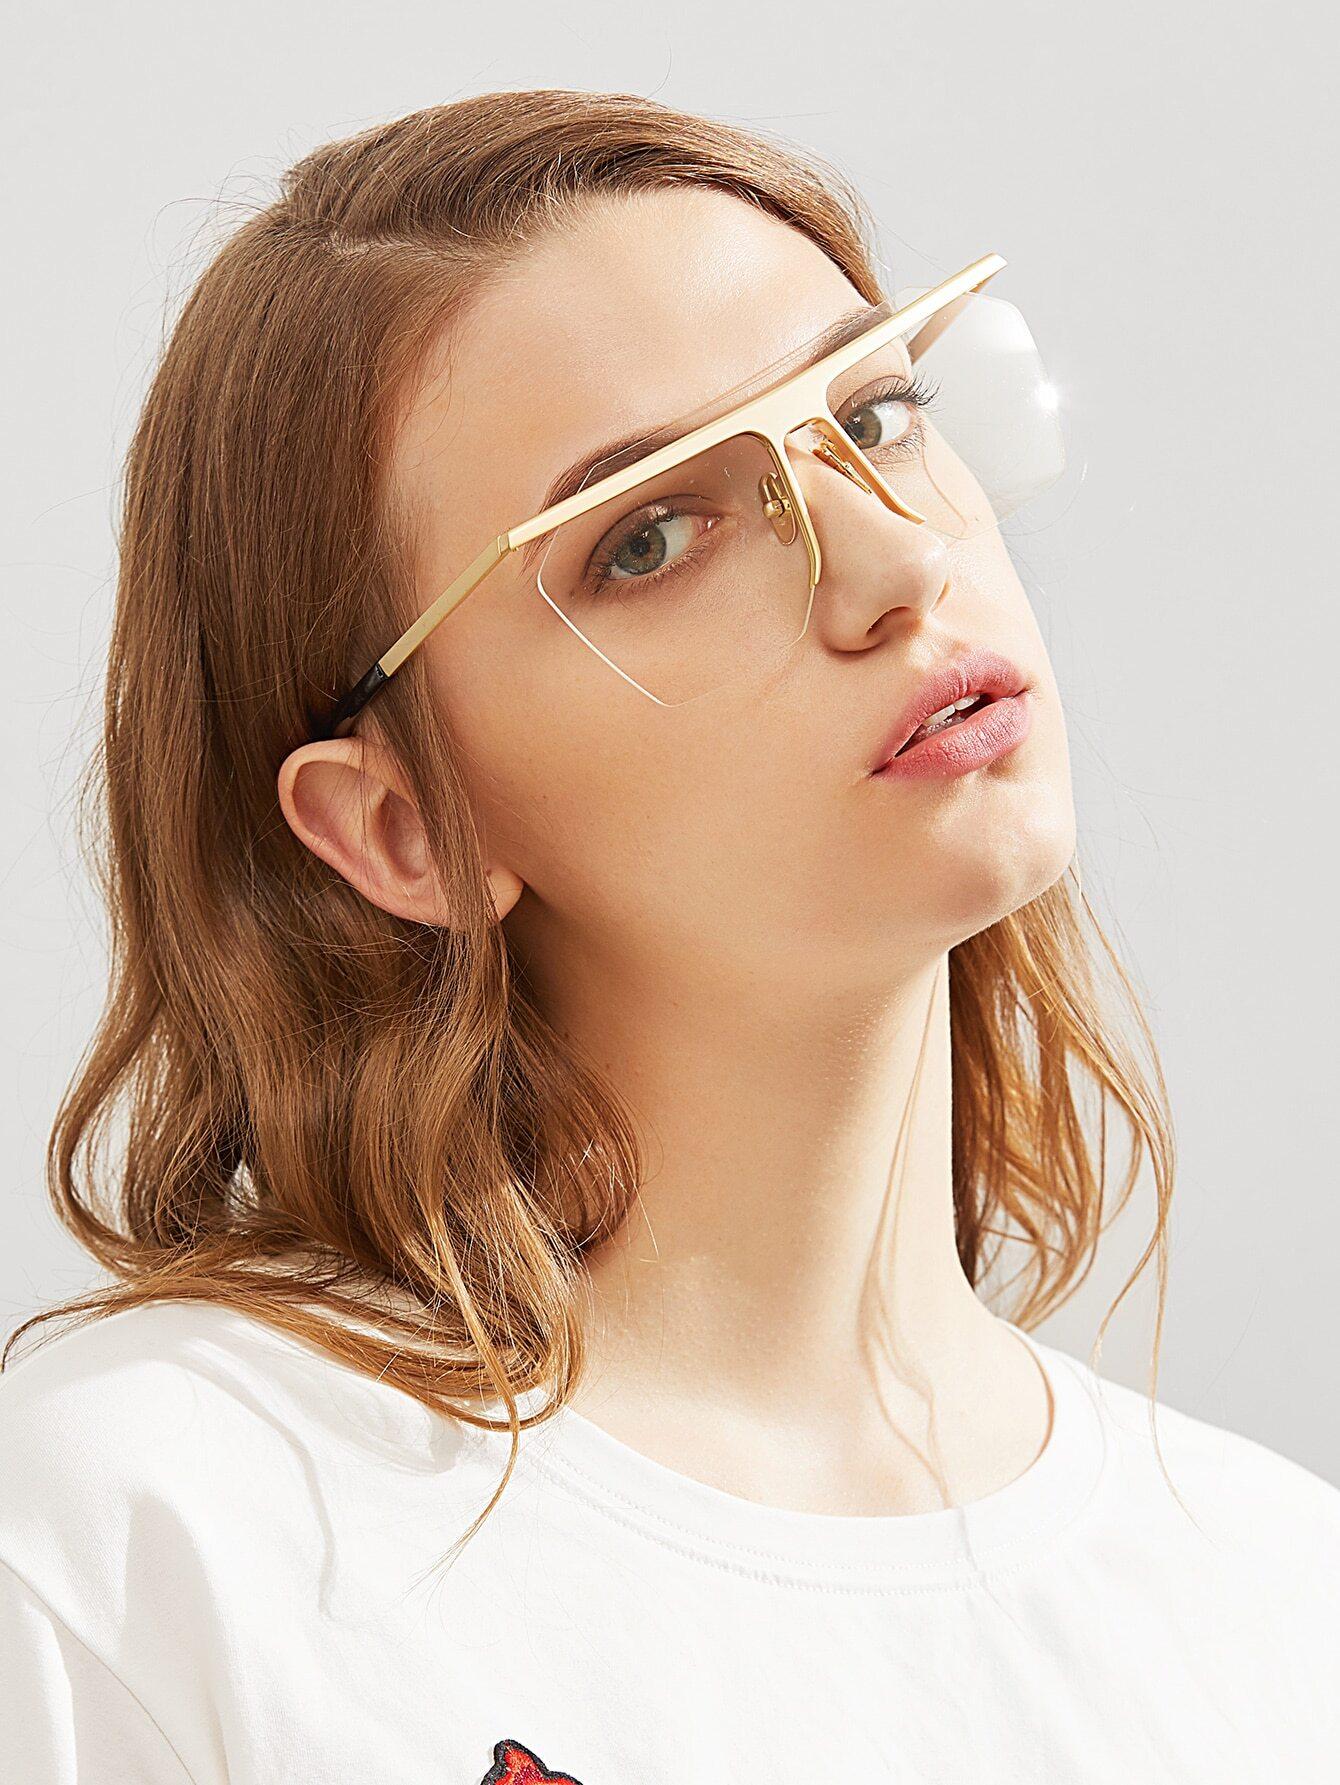 Contrast Frame Clear Lens Glasses sunglass170515303